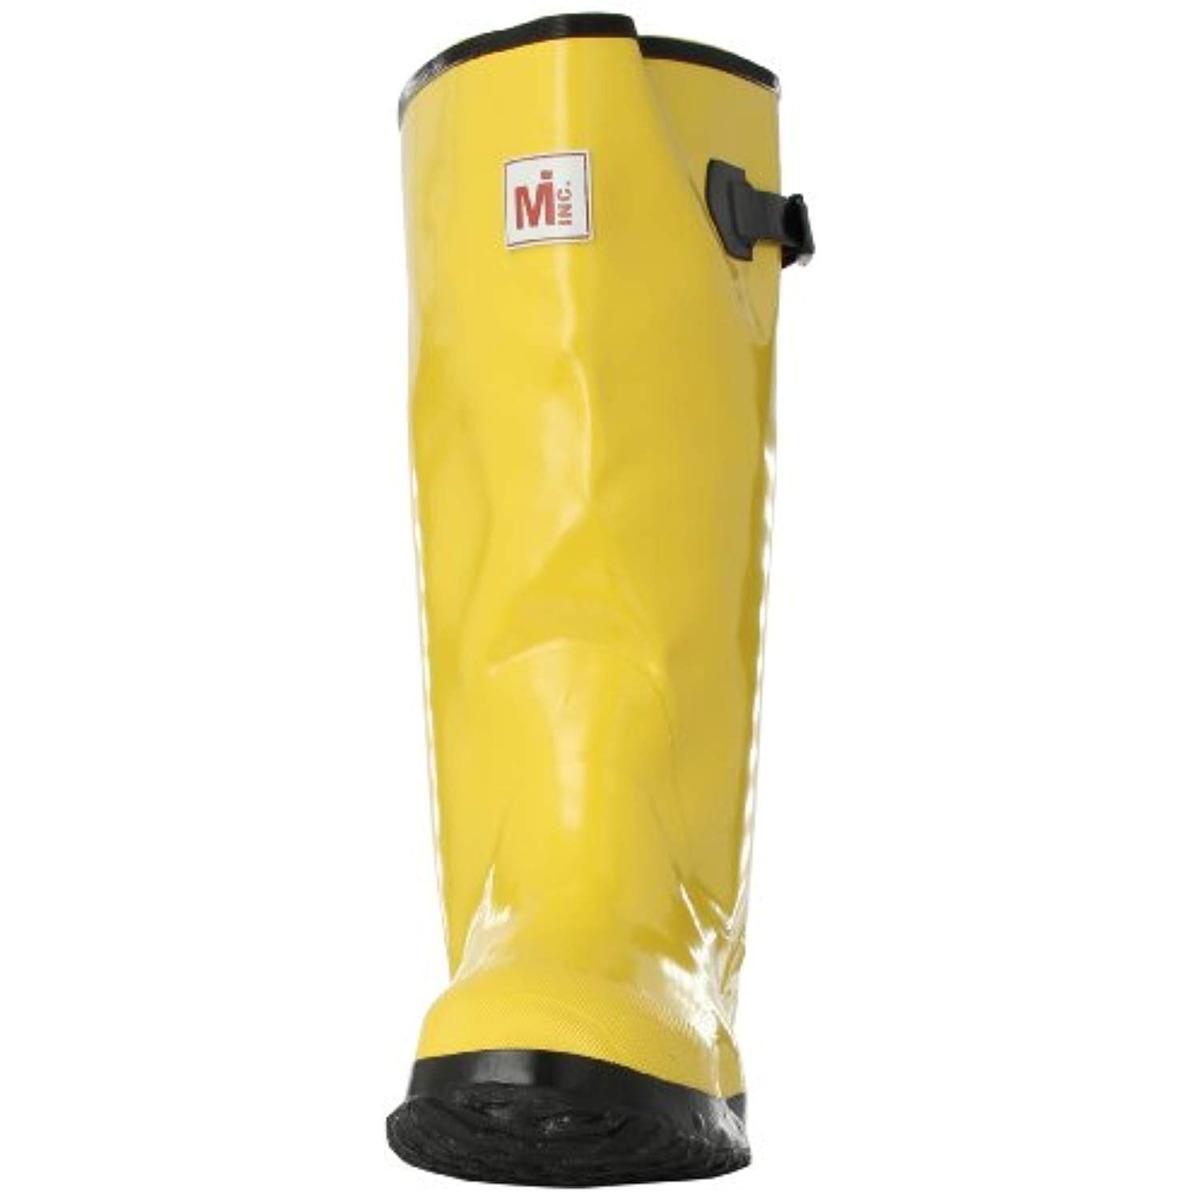 a3d2c27c58887 Calzado De Seguridad Bota Slush Trabajo Over-the-shoe